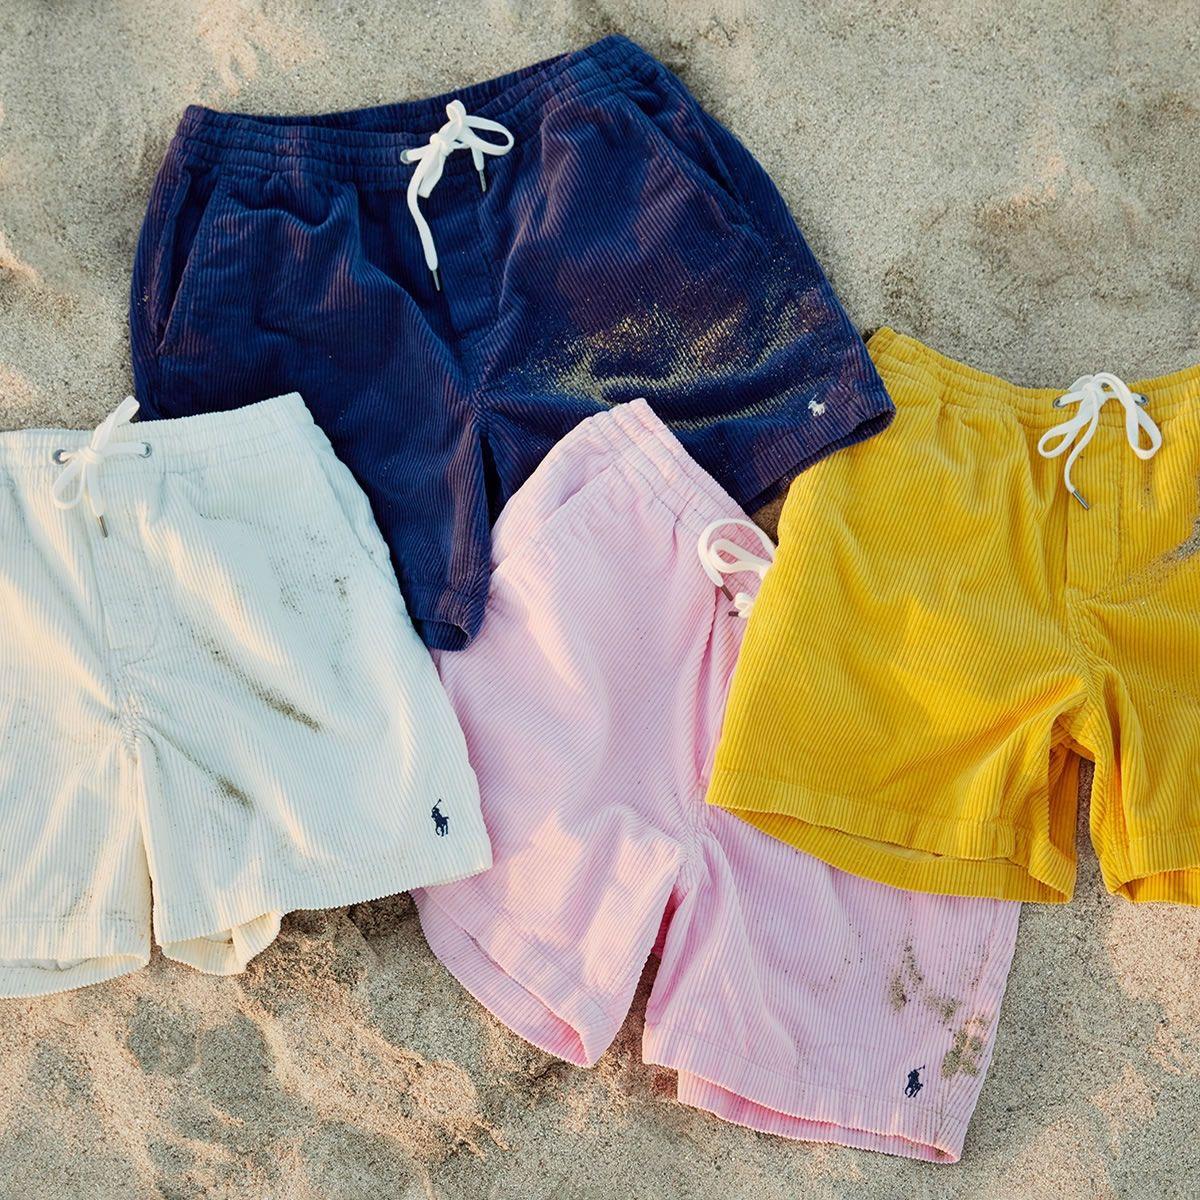 Shorts and Swim